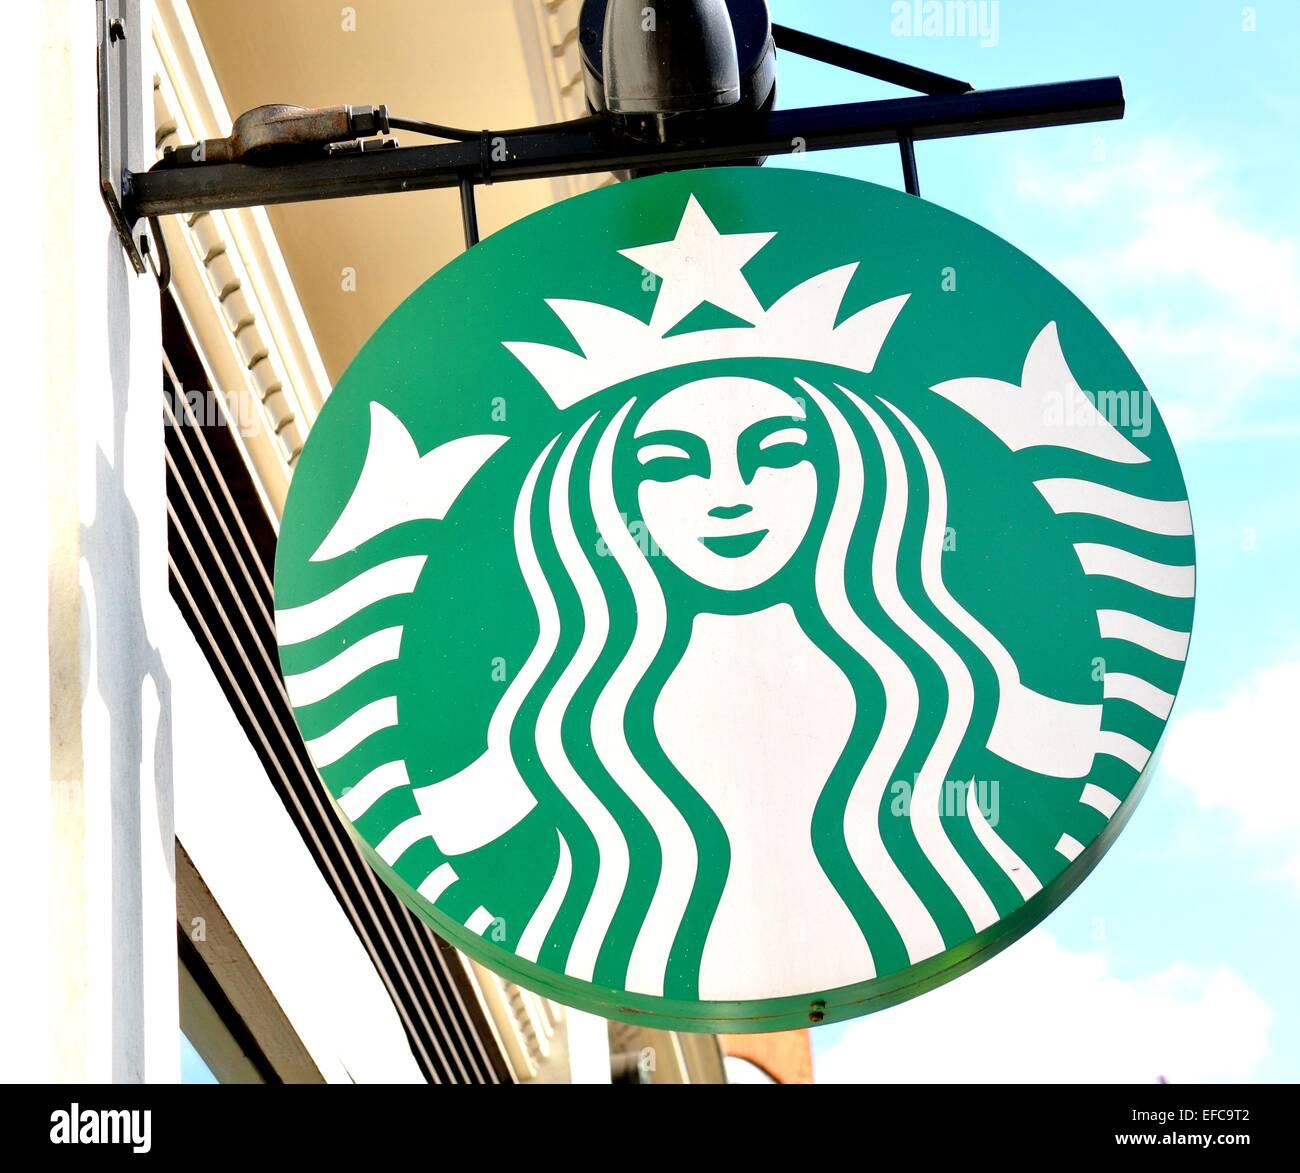 Starbucks branding stock photos starbucks branding stock images london uk july 9 2014 close up of starbucks logo biocorpaavc Image collections